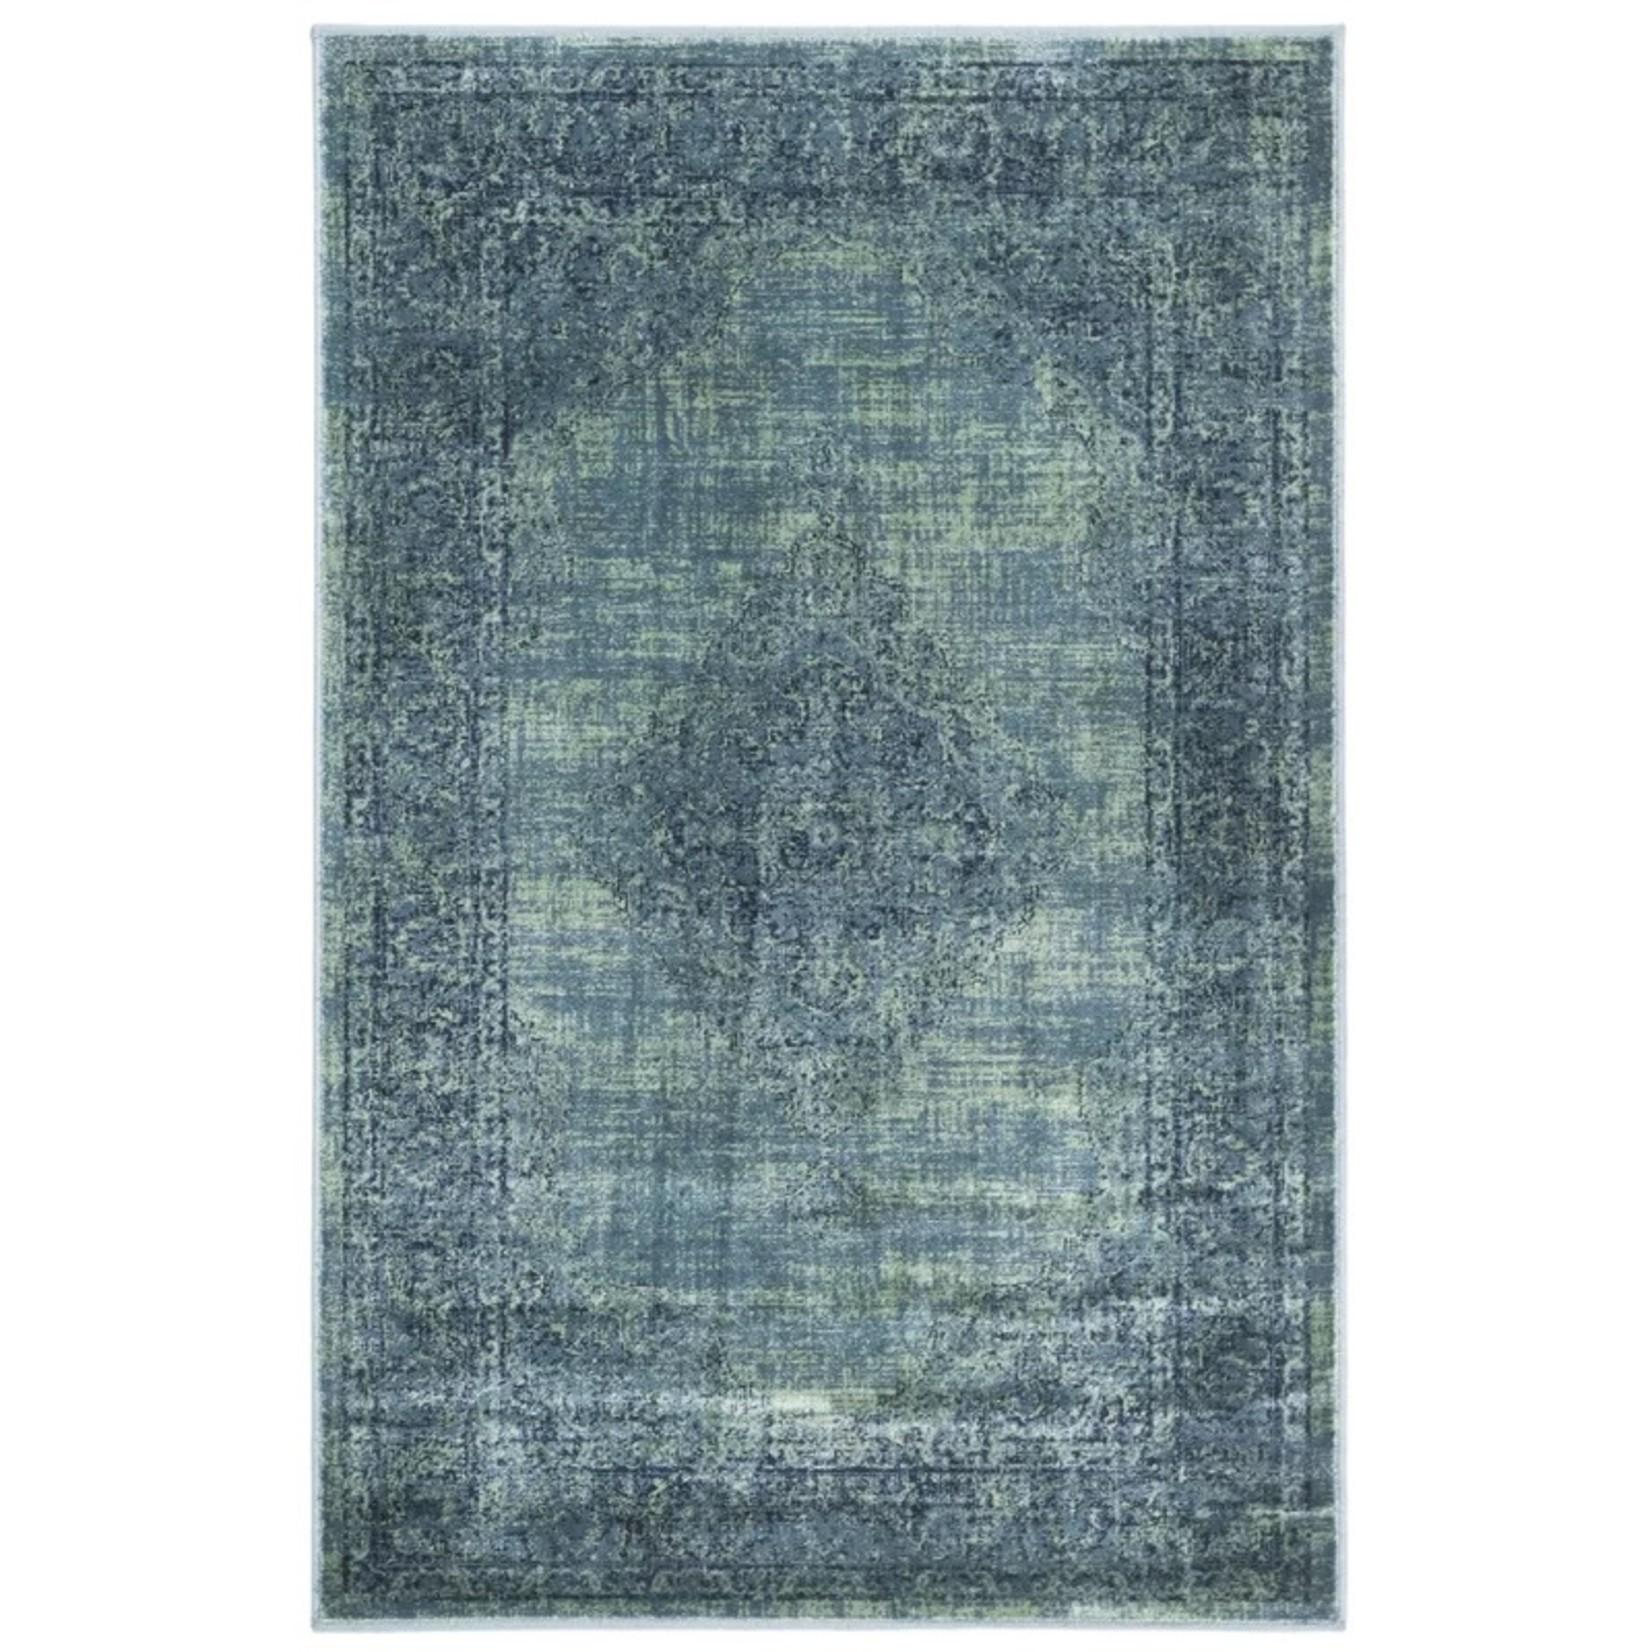 *8' X 10' - Makenna Turquoise/Blue Area Rug